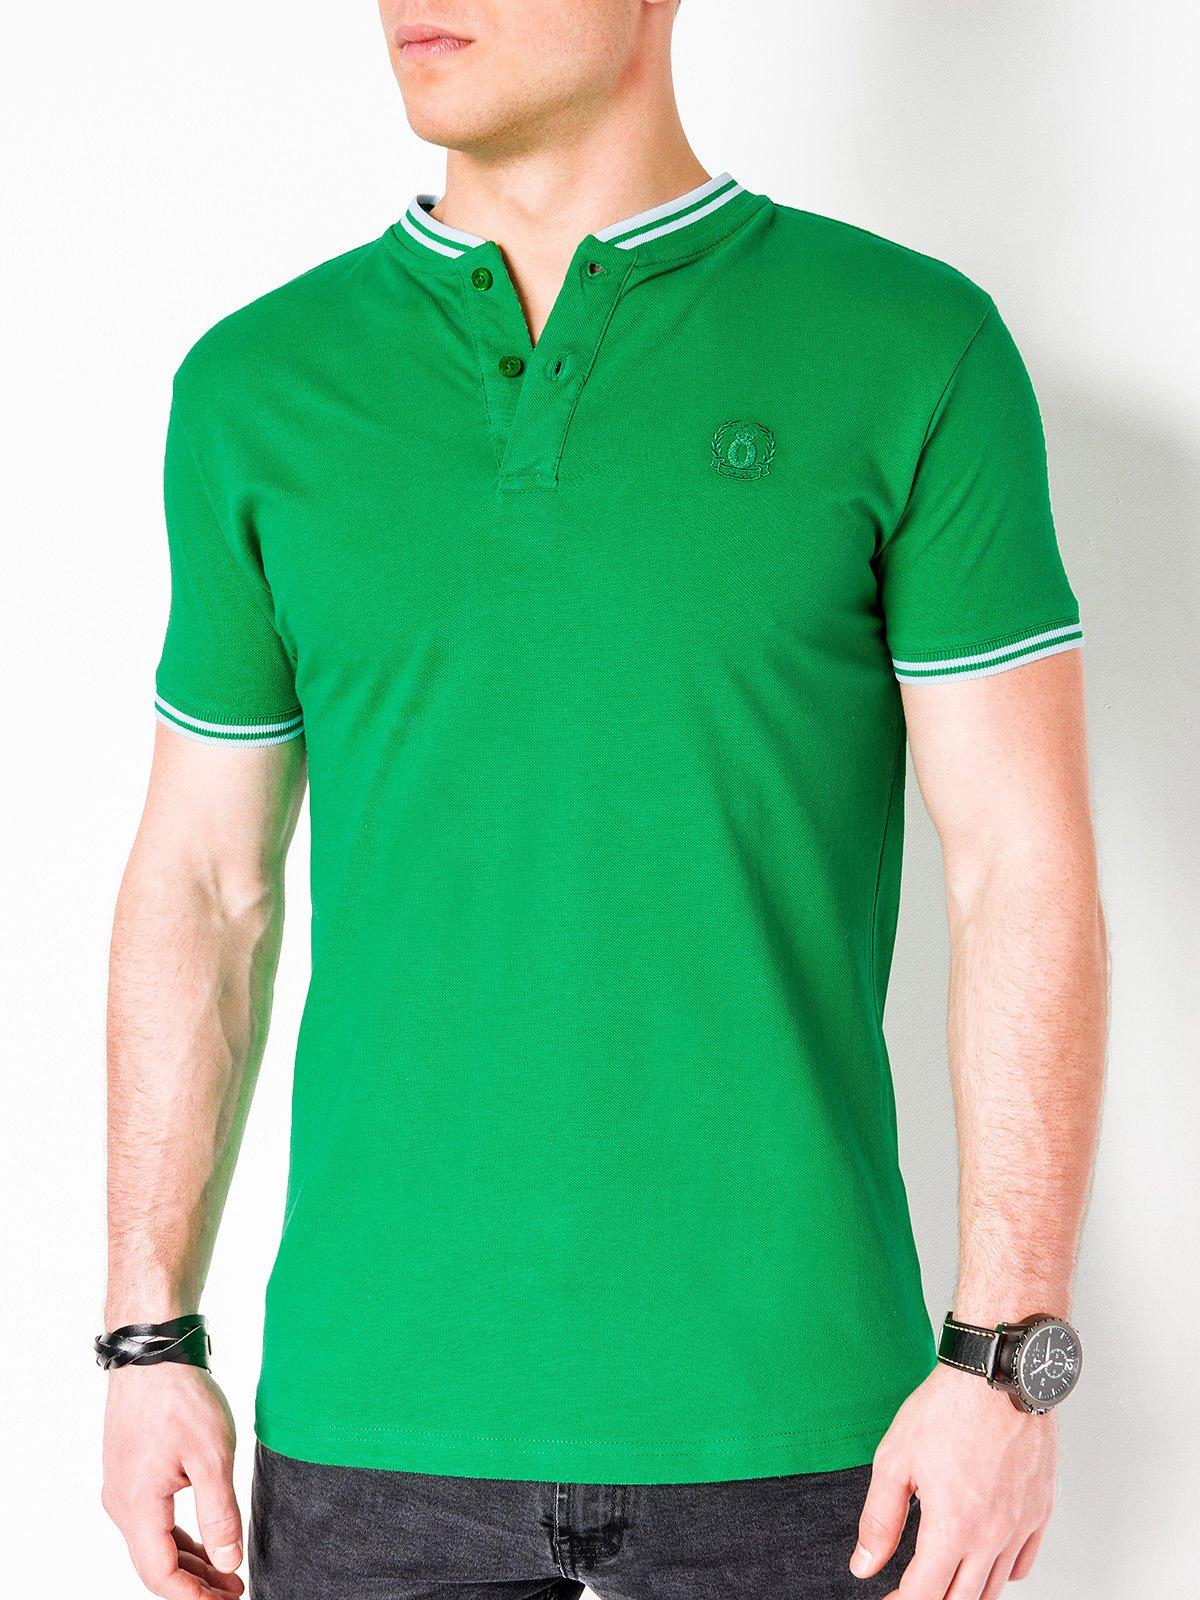 25996b517a009 Matalan Mens Black Polo Shirts | Kuenzi Turf & Nursery